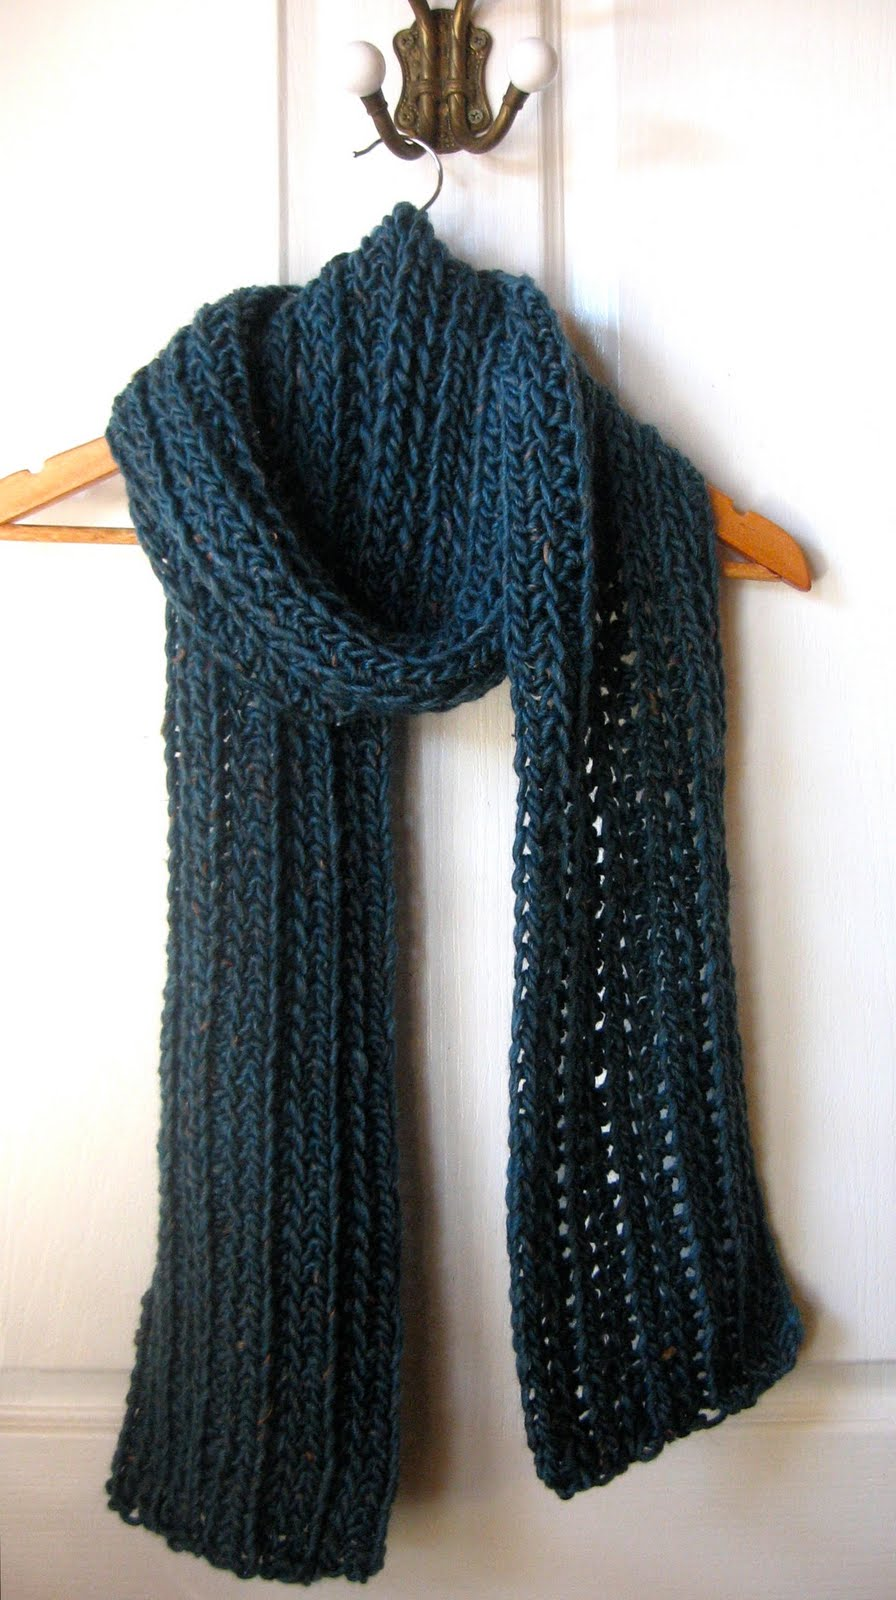 30 Crochet Scarves Patterns + Photos